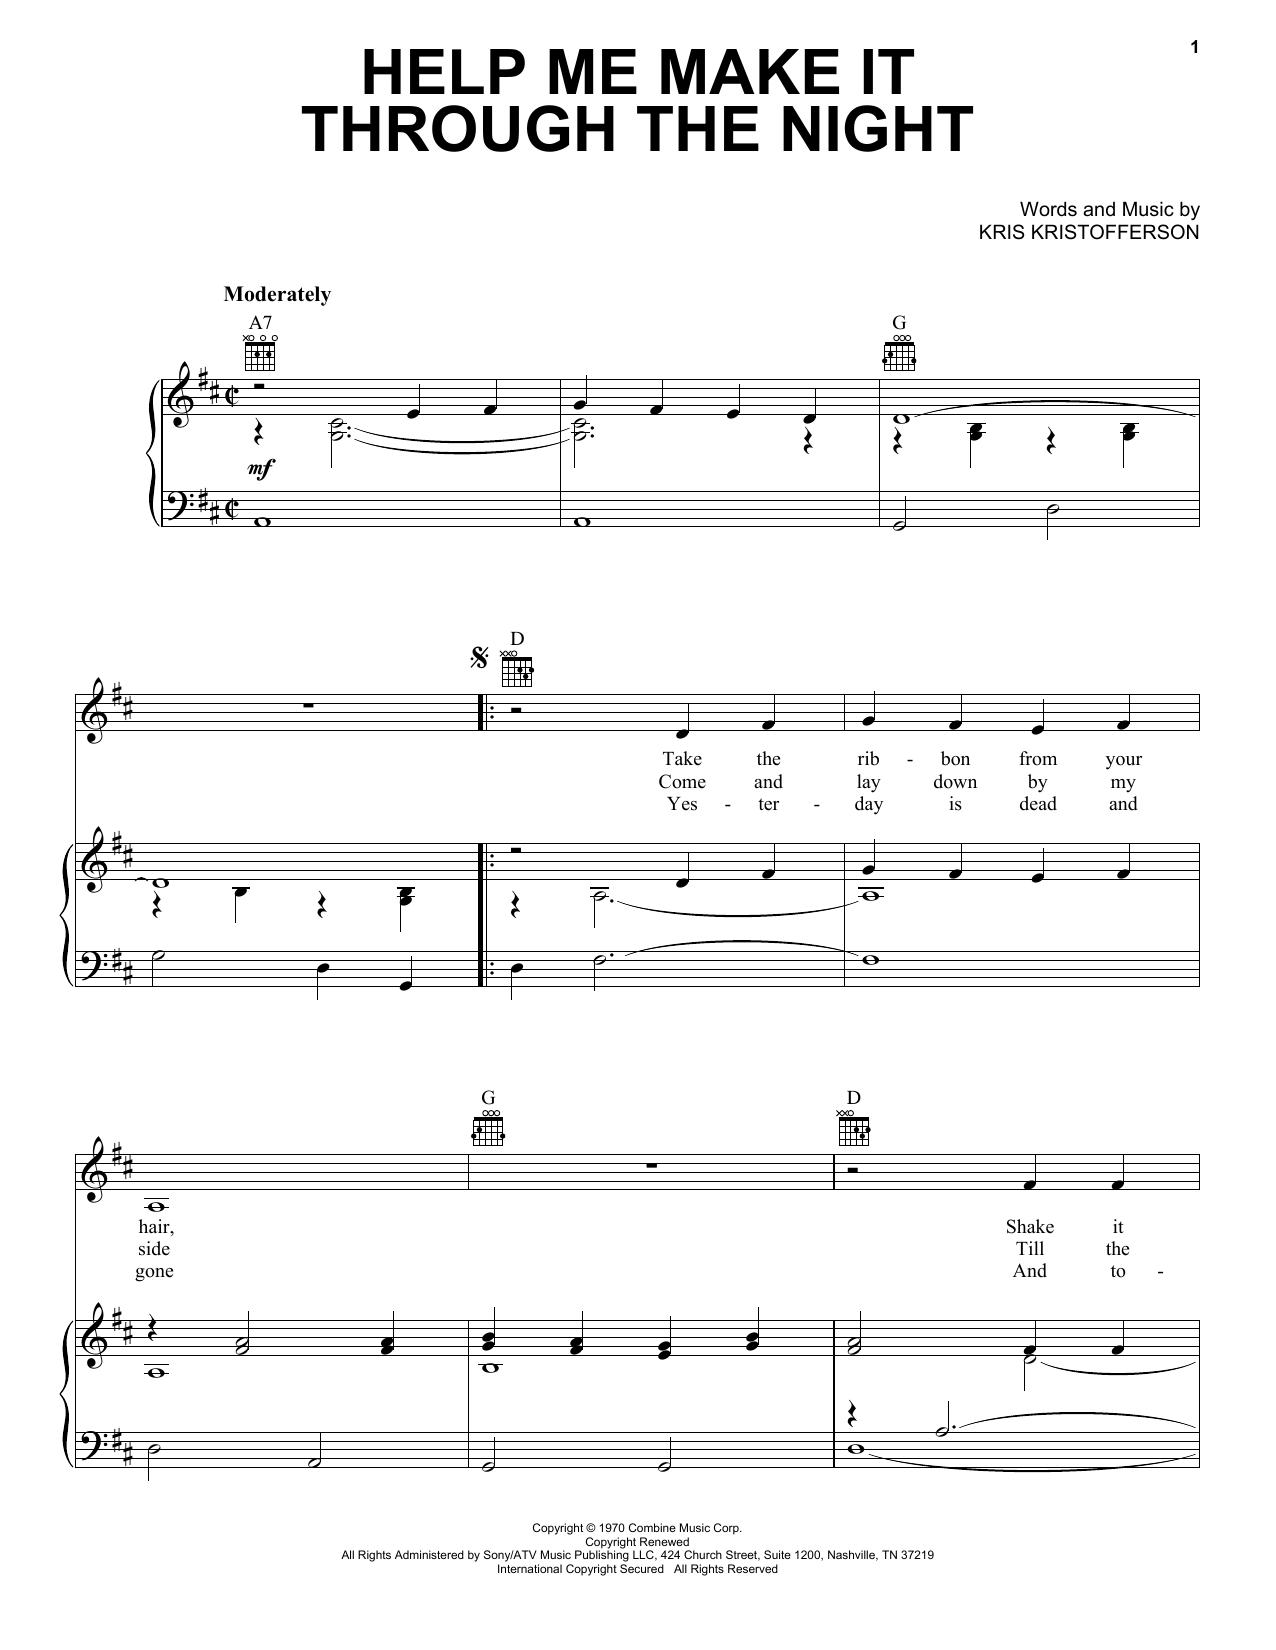 Kris Kristofferson Help Me Make It Through The Night sheet music notes and chords. Download Printable PDF.